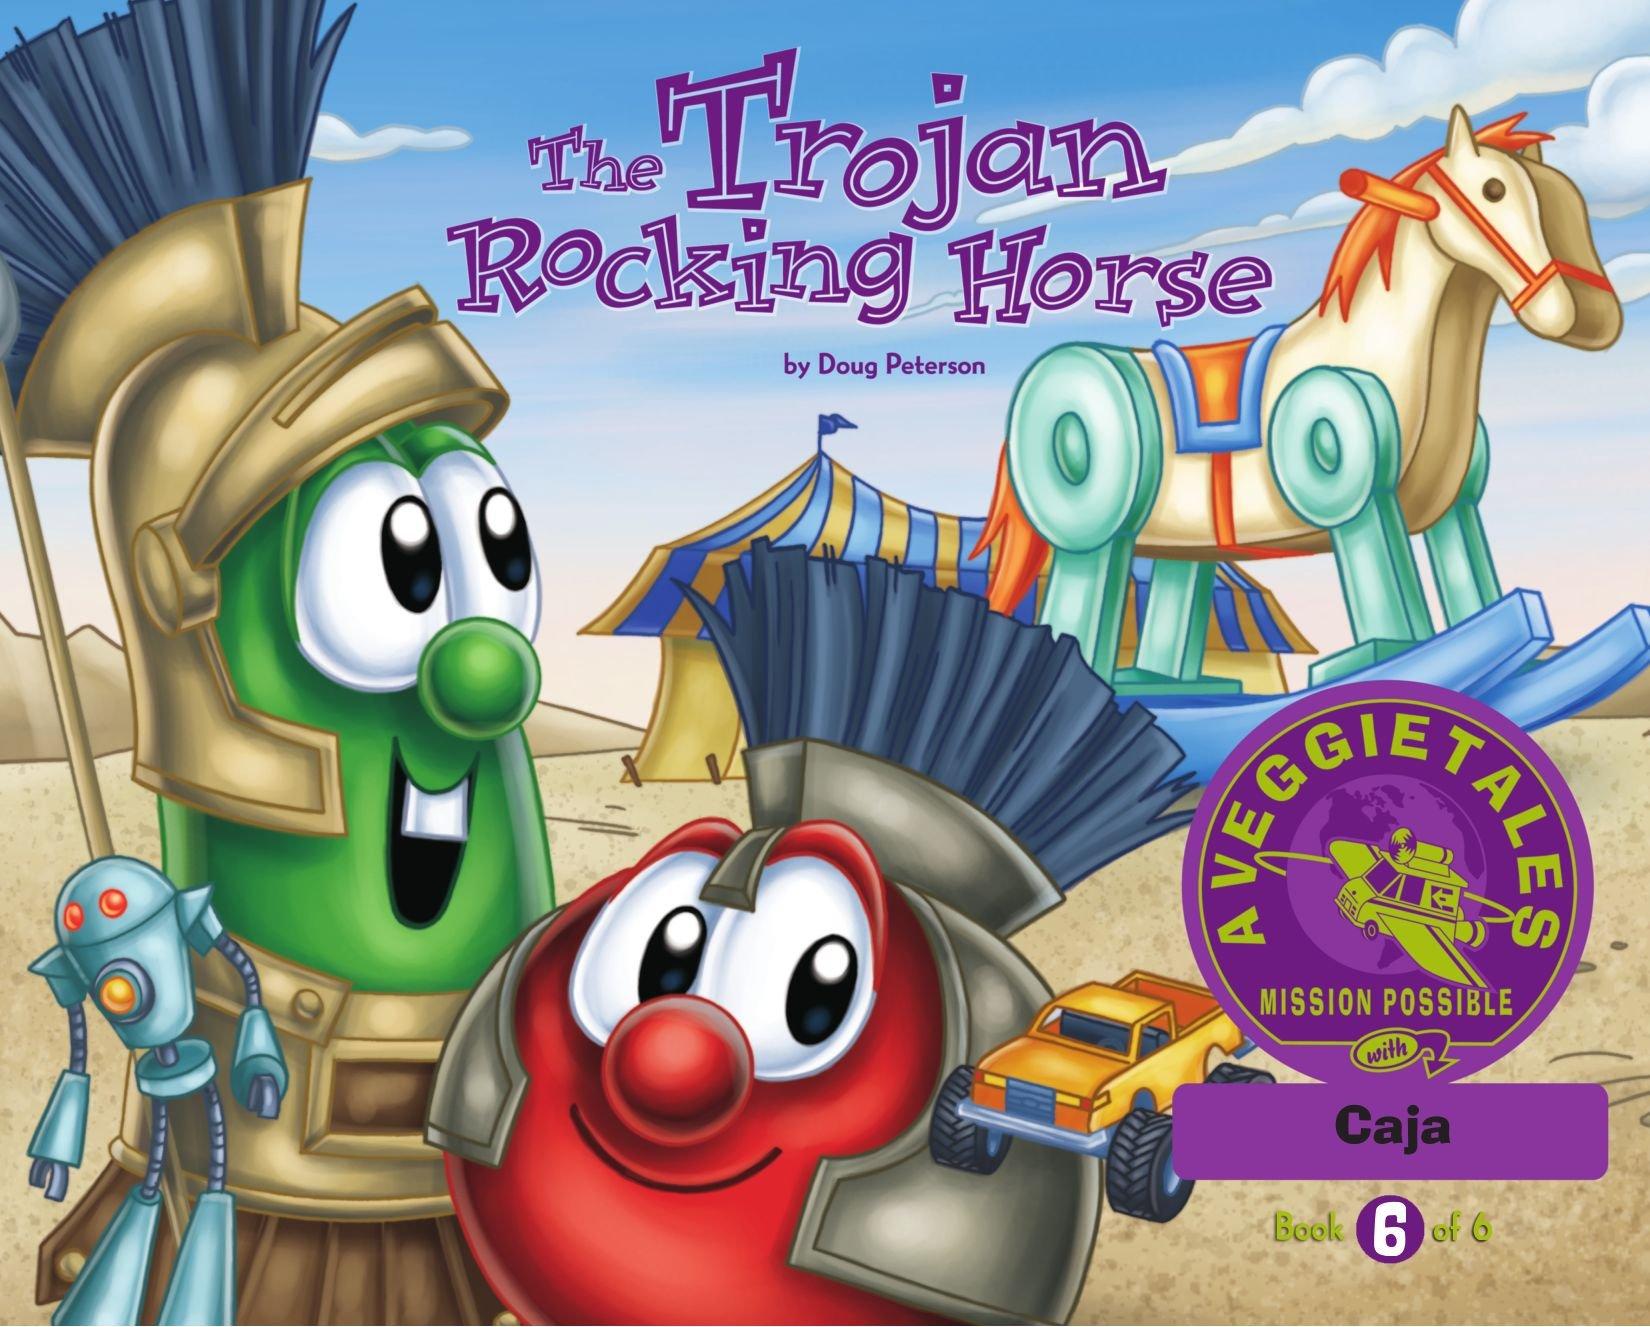 Download The Trojan Rocking Horse - VeggieTales Mission Possible Adventure Series #6: Personalized for Caja (Boy) pdf epub